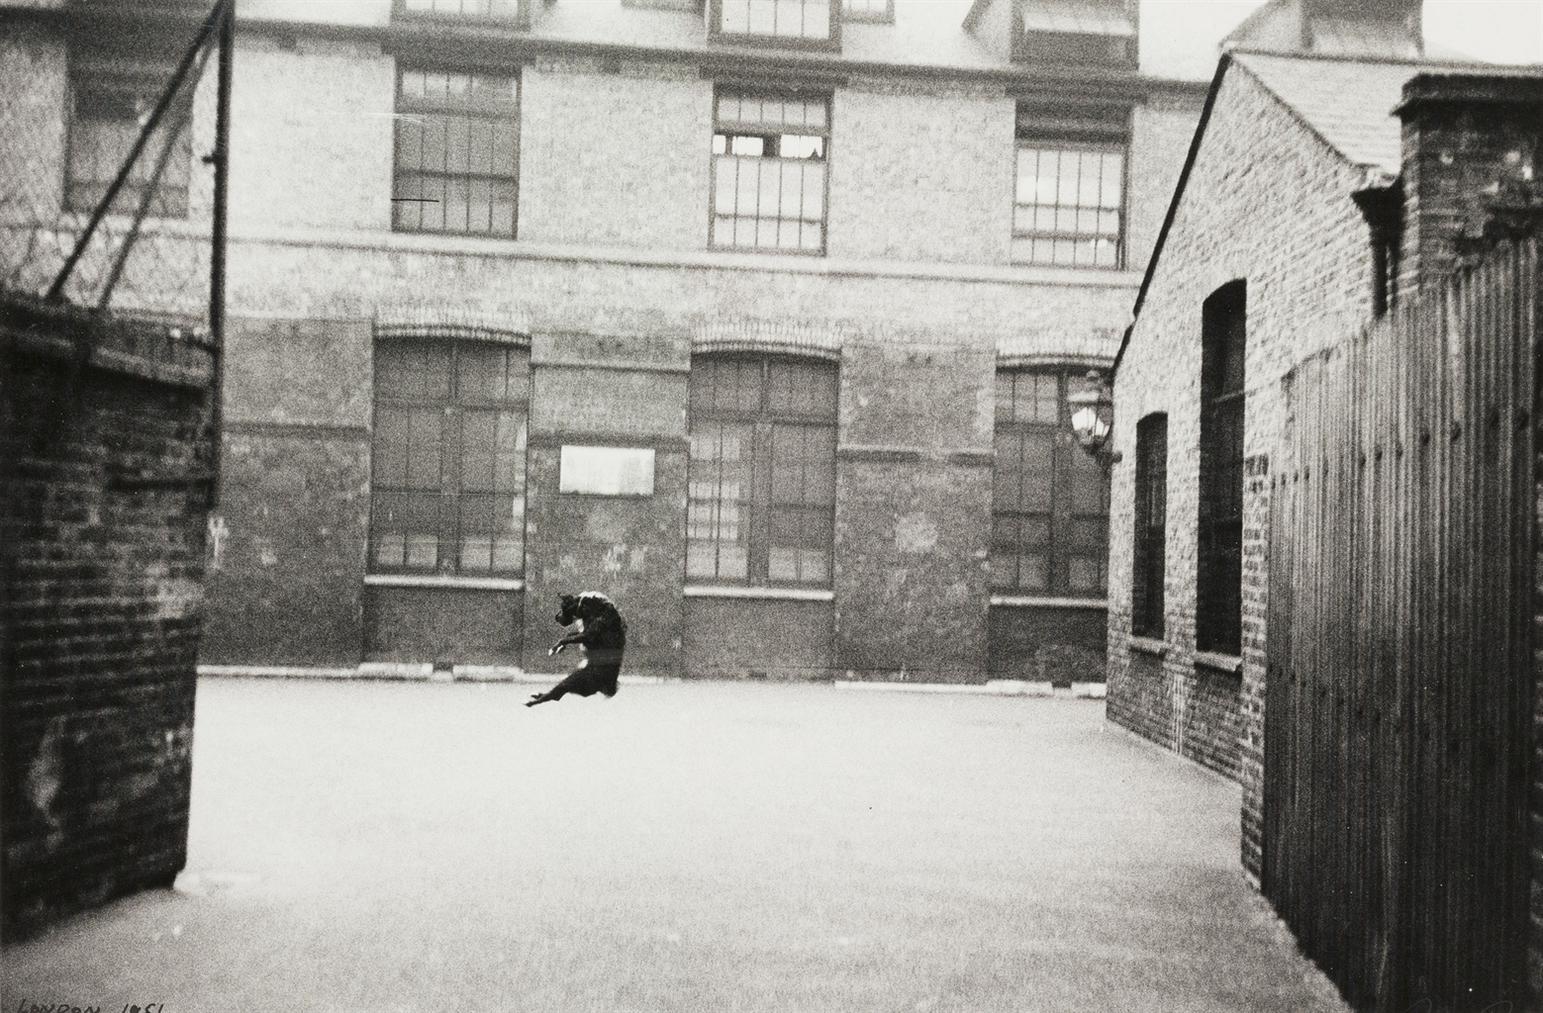 Robert Frank-London-1951